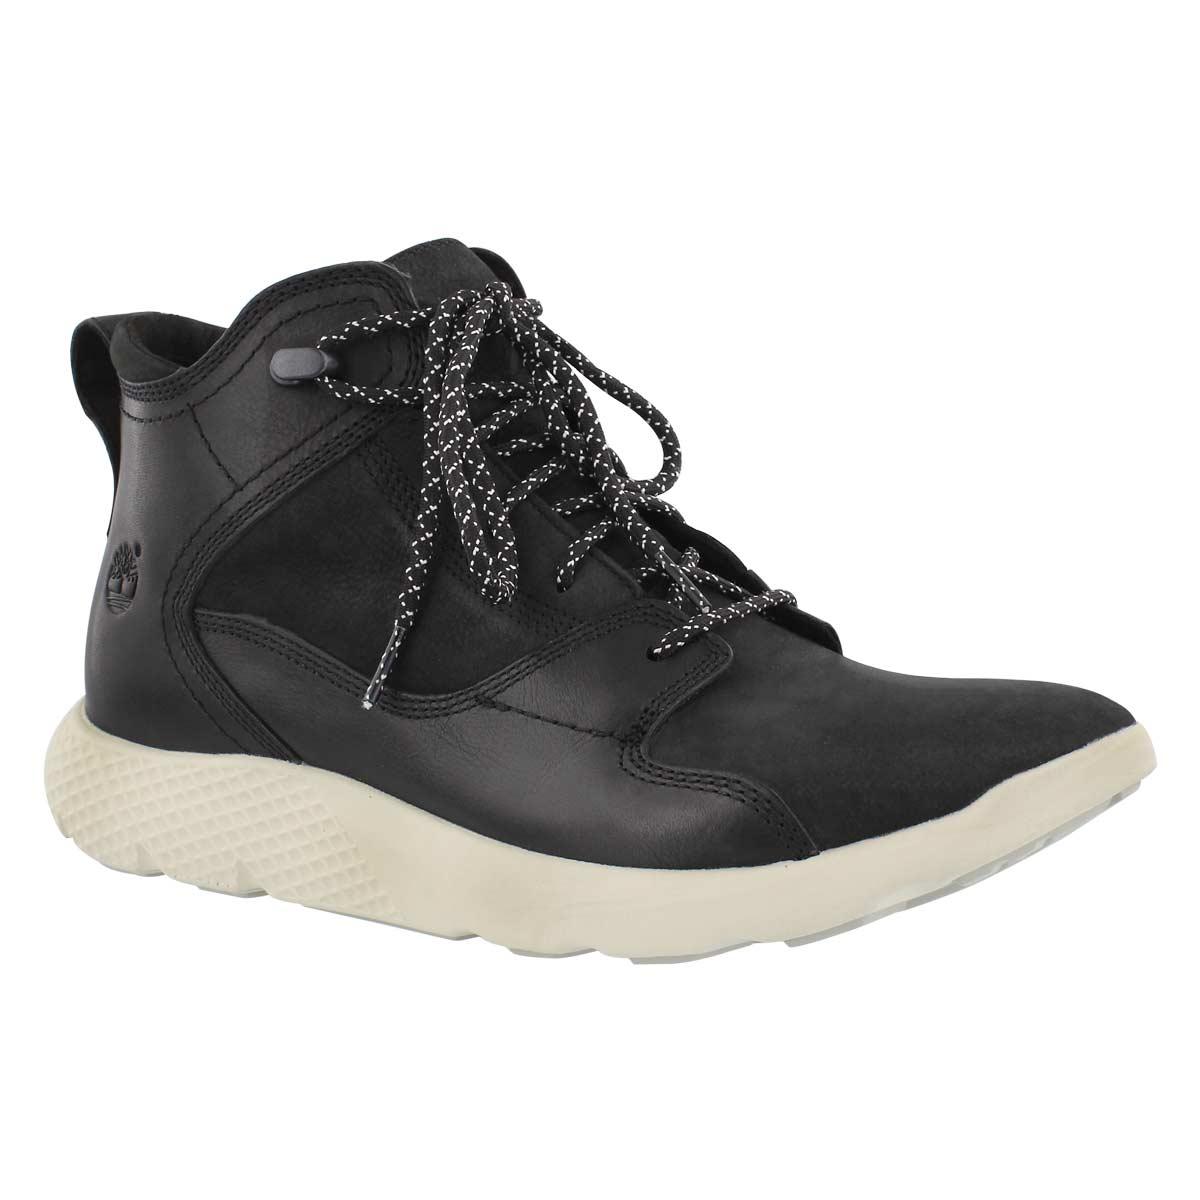 453e3490810 Men's FLY ROAM black hiking boots